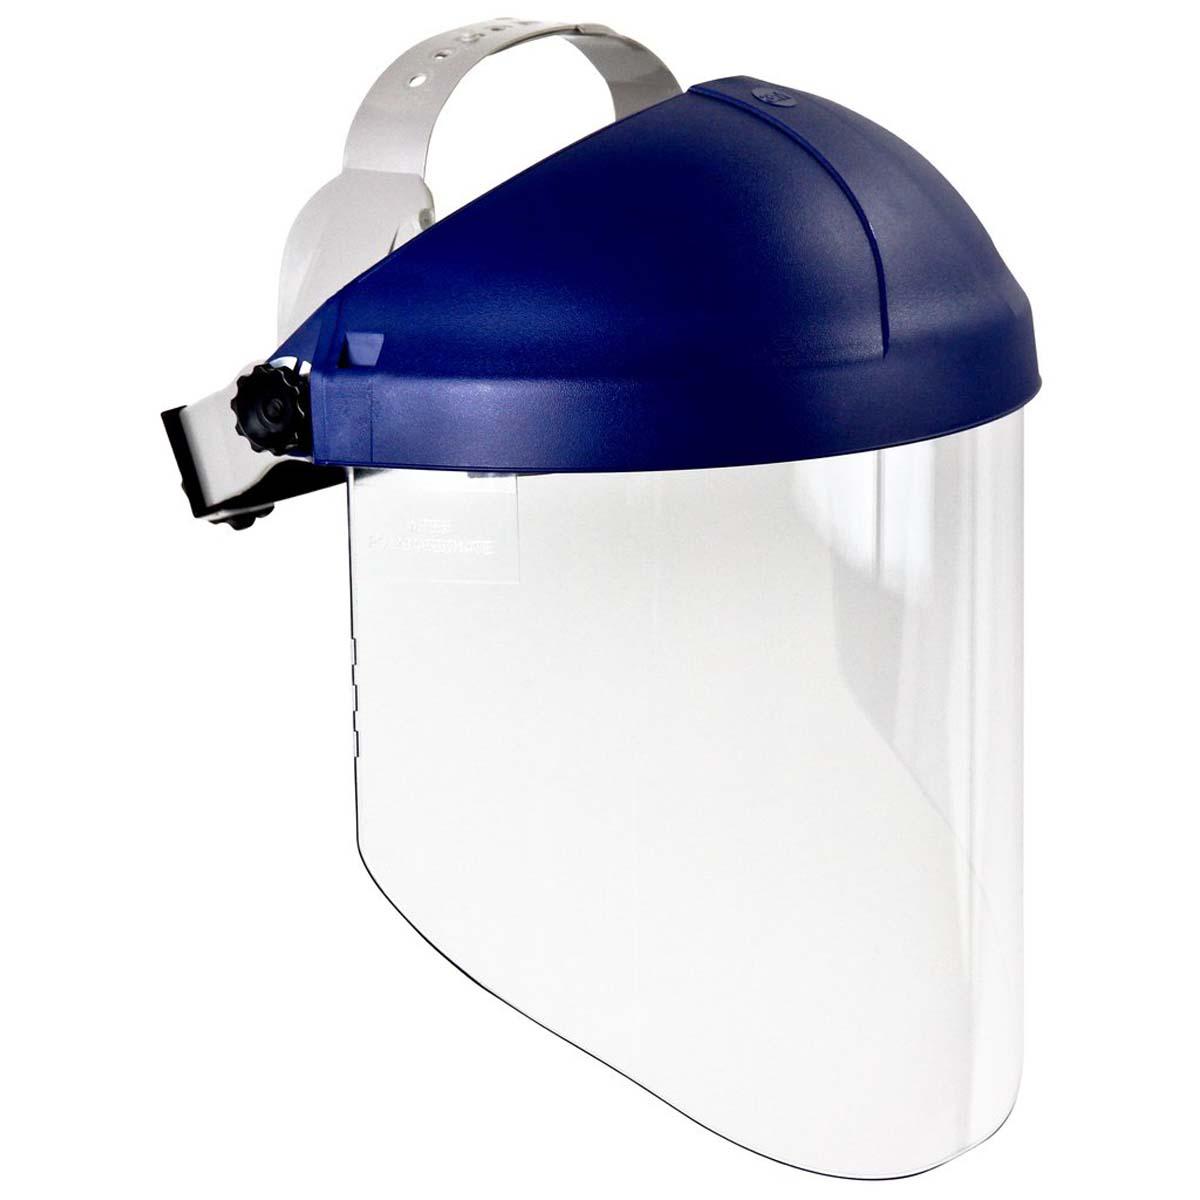 "3Mâ""¢ Ratchet Headgear H8A, 82783-00000, with 3Mâ""¢ Clear Polycarbonate Faceshield WP96"